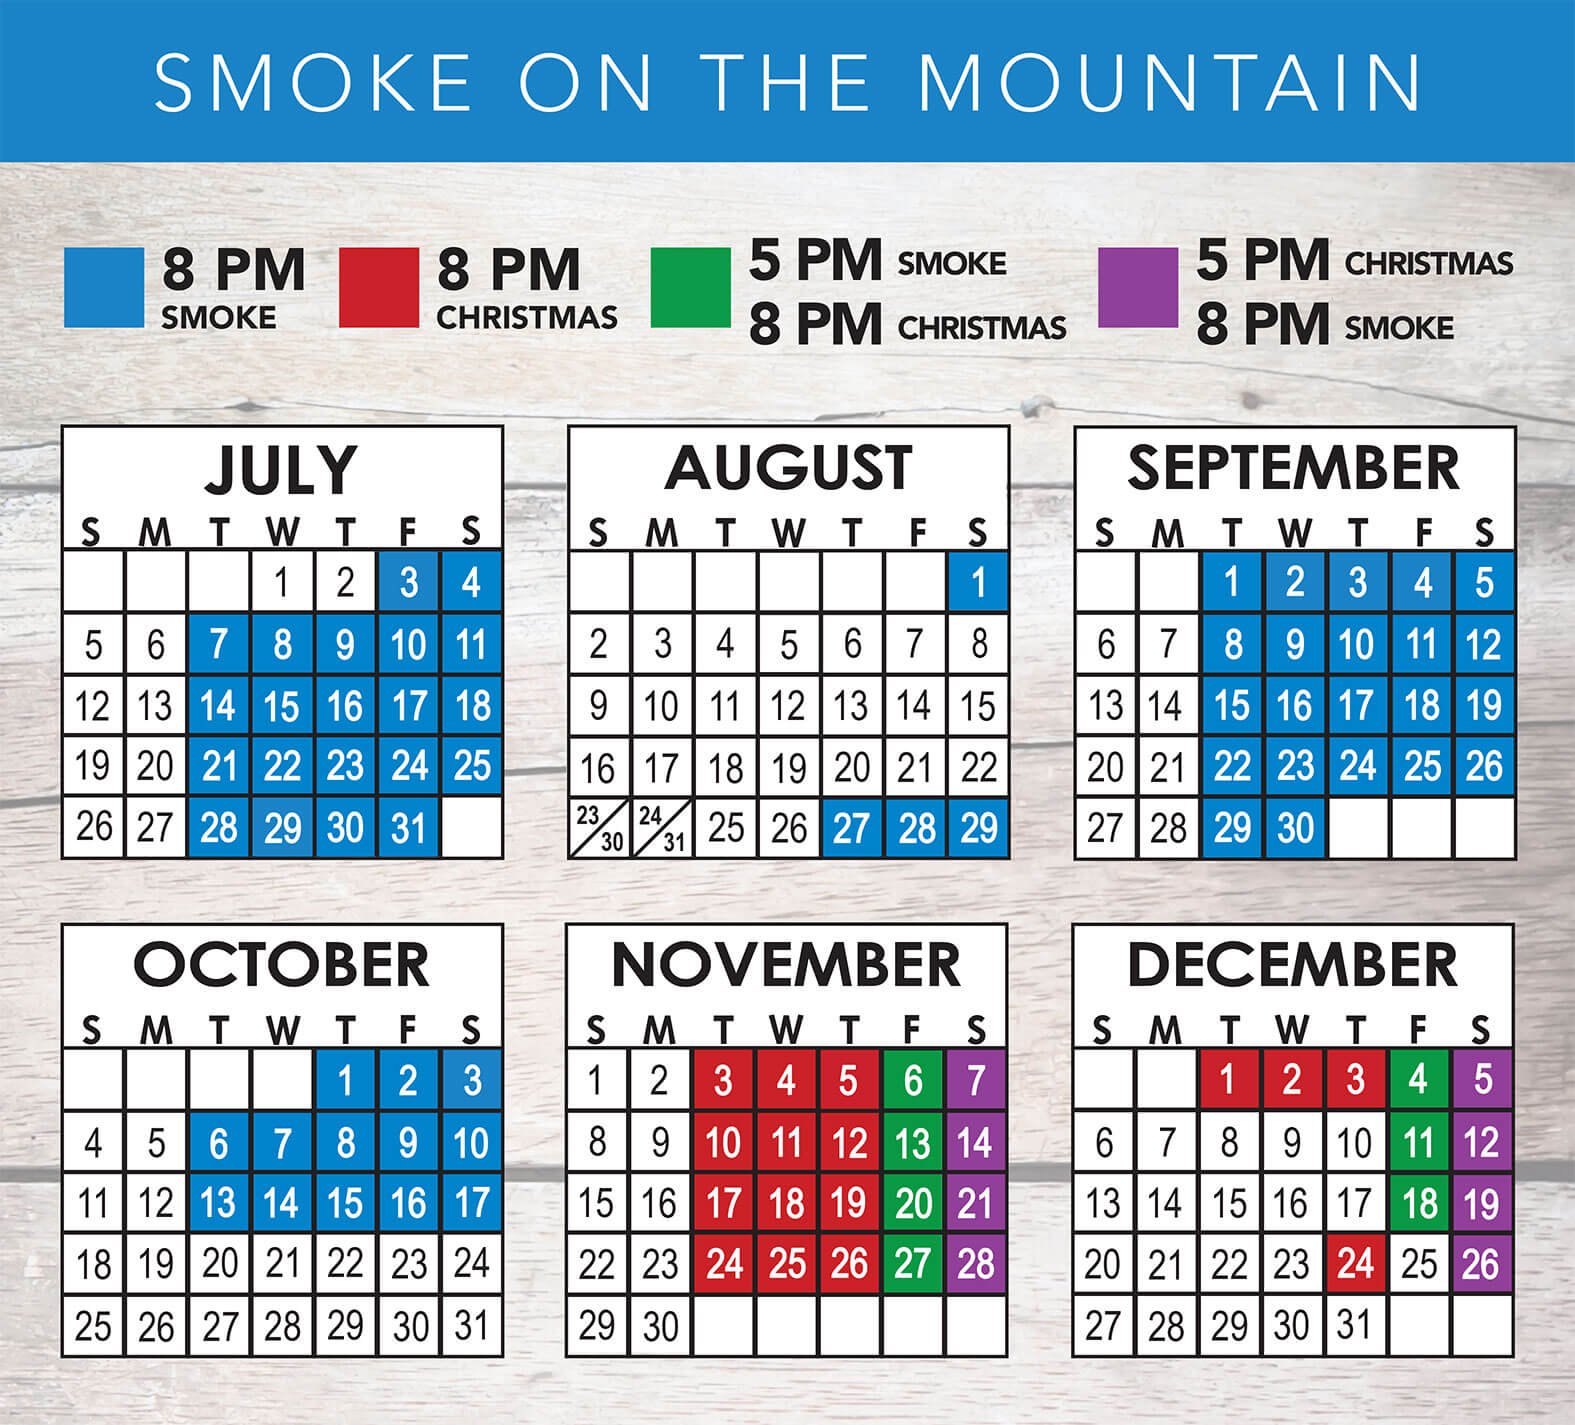 Smoke on the Mountain 2020 Schedule